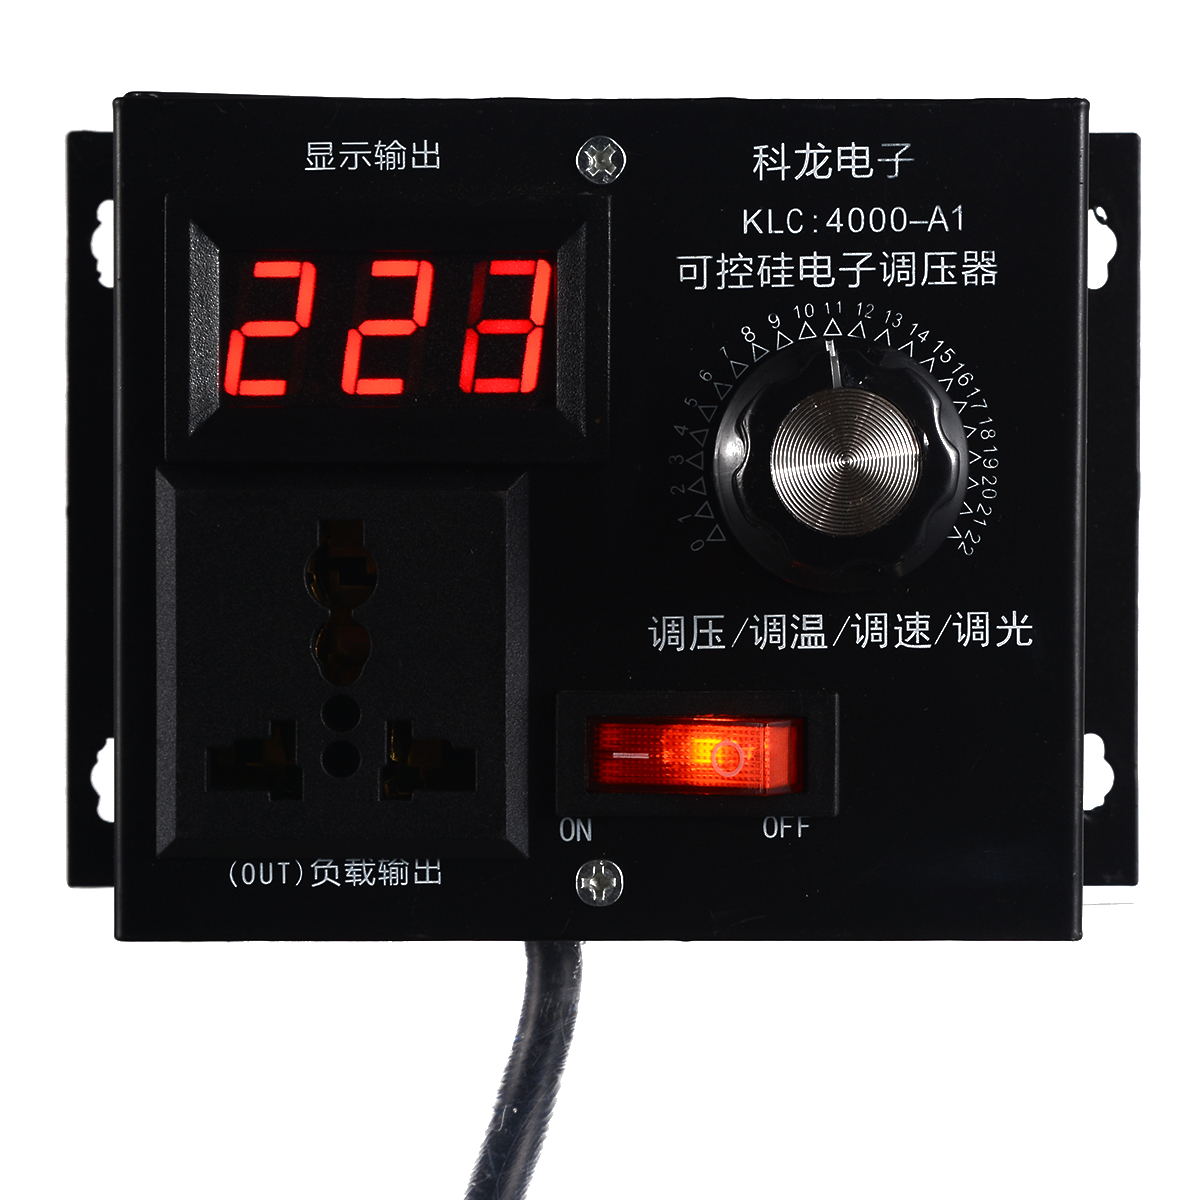 High Power Elektronische Spannung Controller 220V 4000W Gesteuert Variable Spannung Controller Für Lüfter Geschwindigkeit Motor Control Dimmer